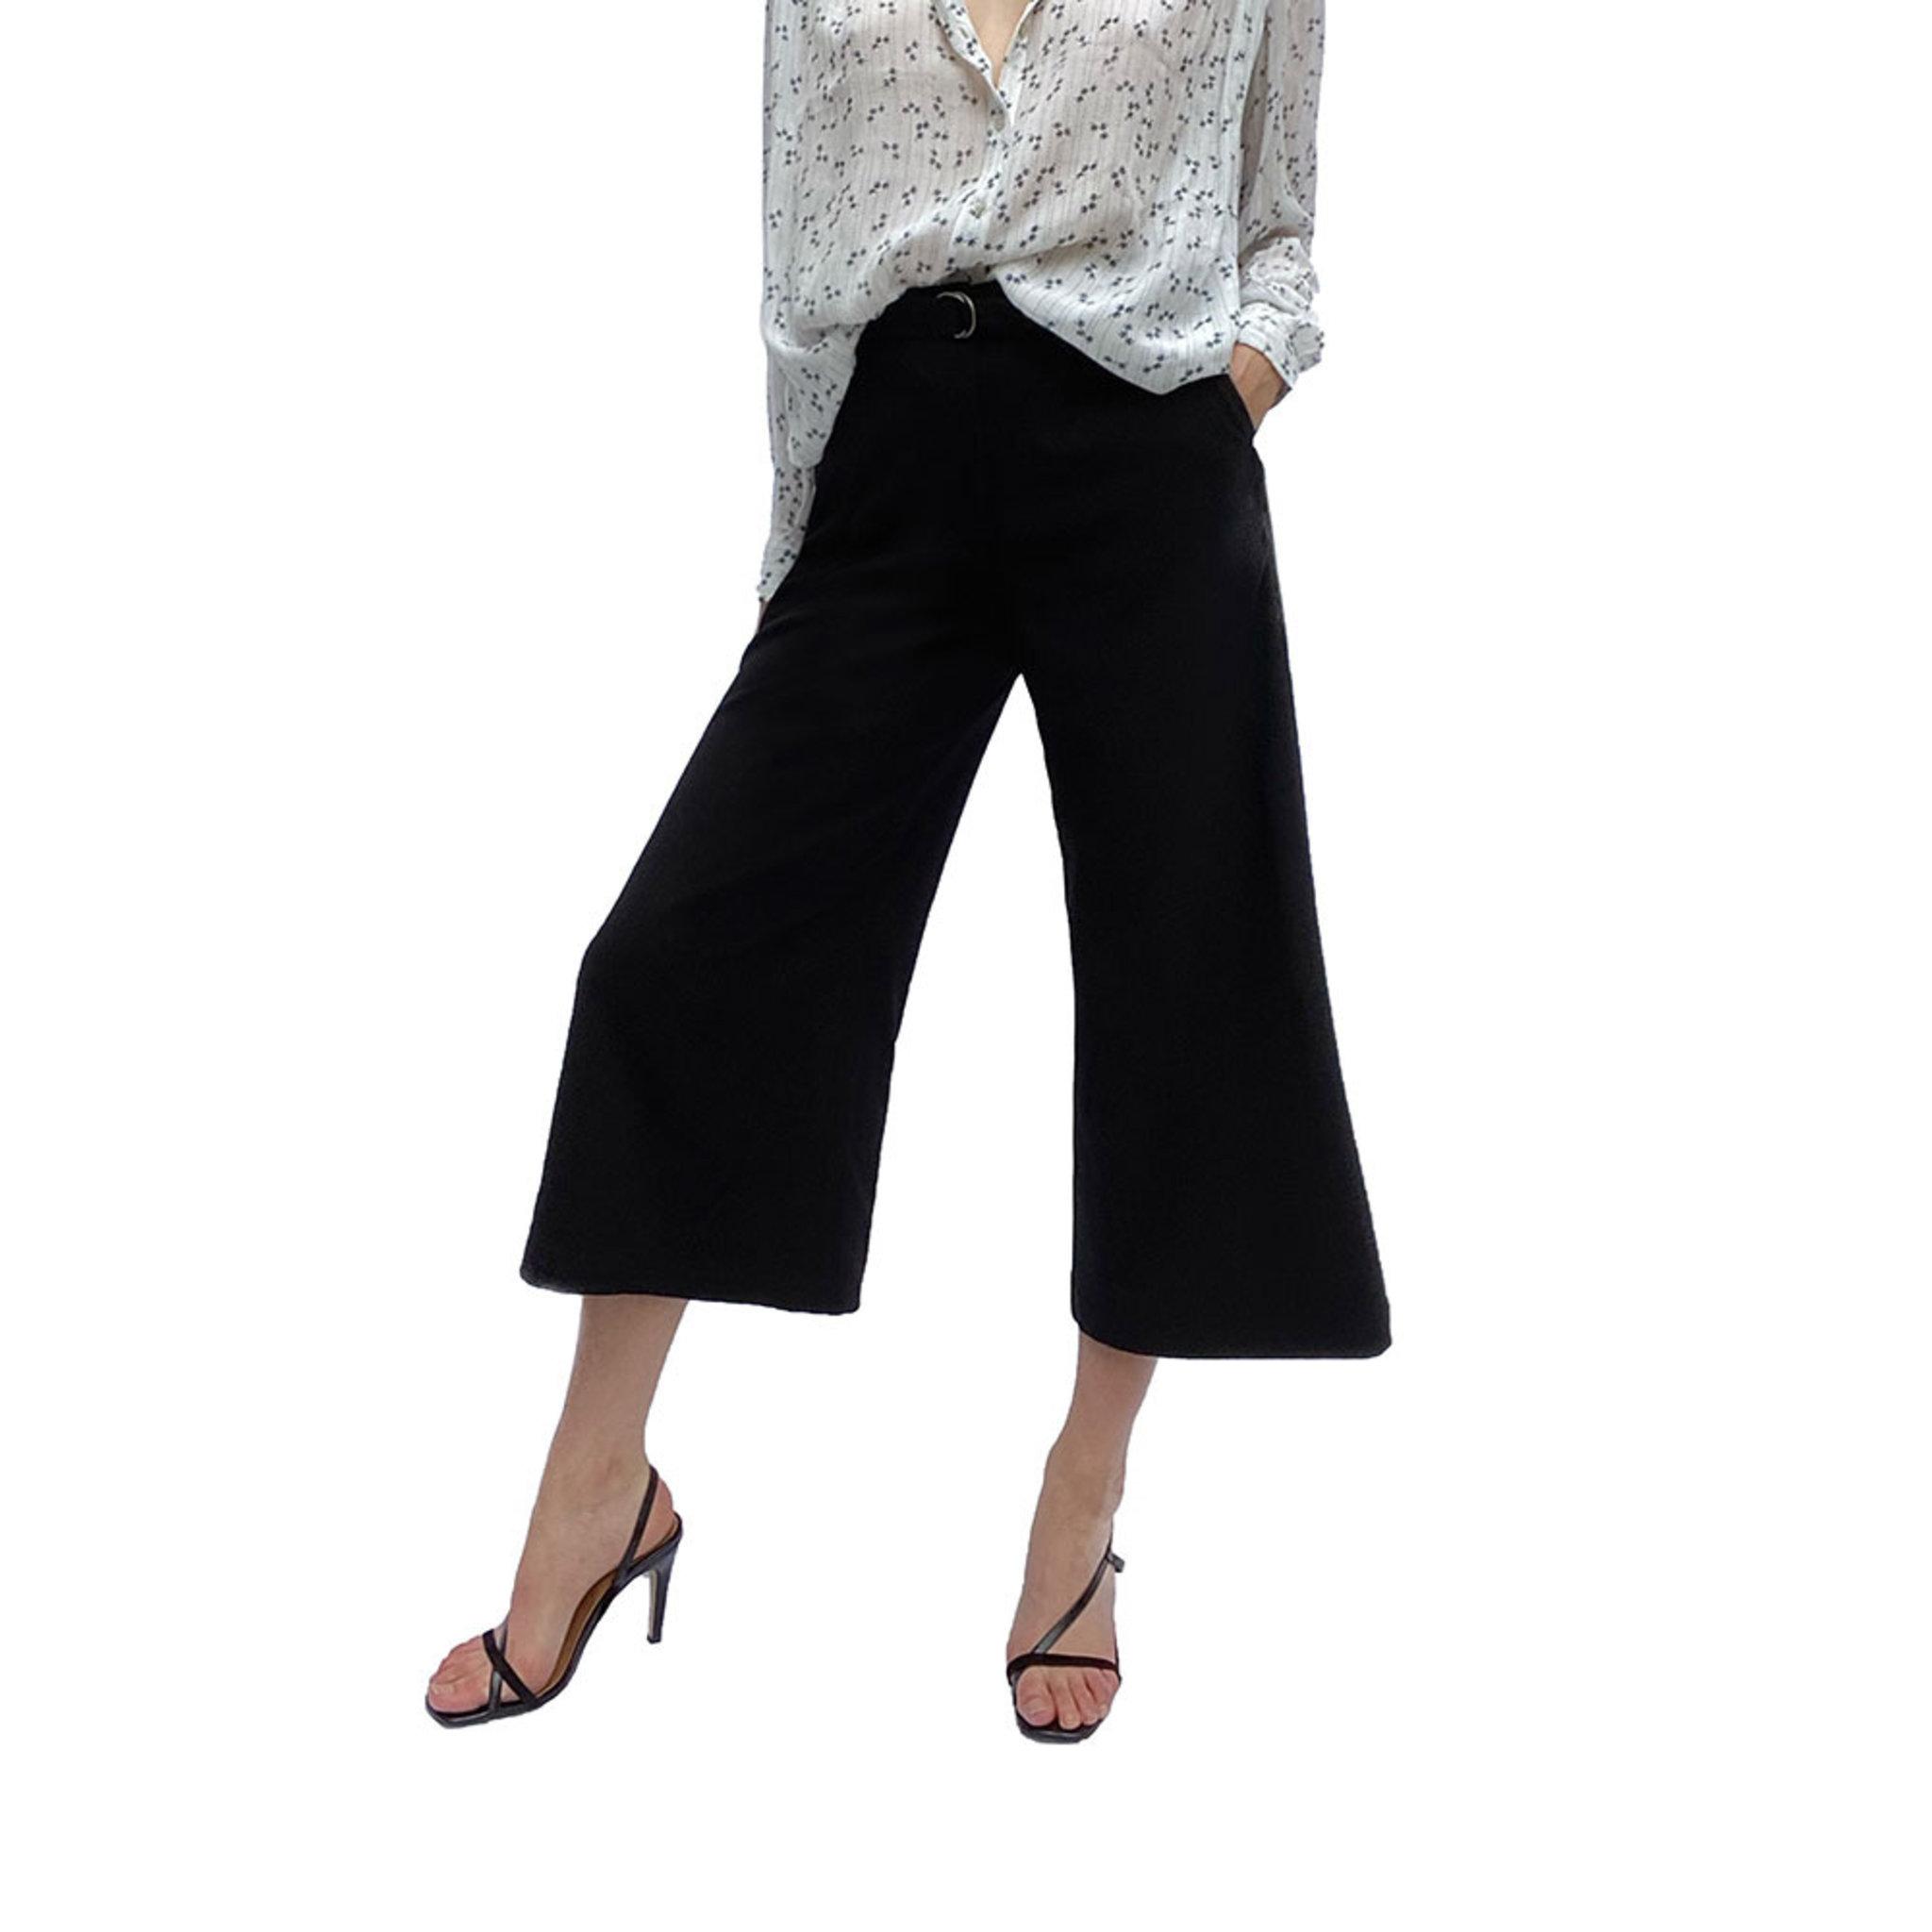 Audeta Cropped Trousers